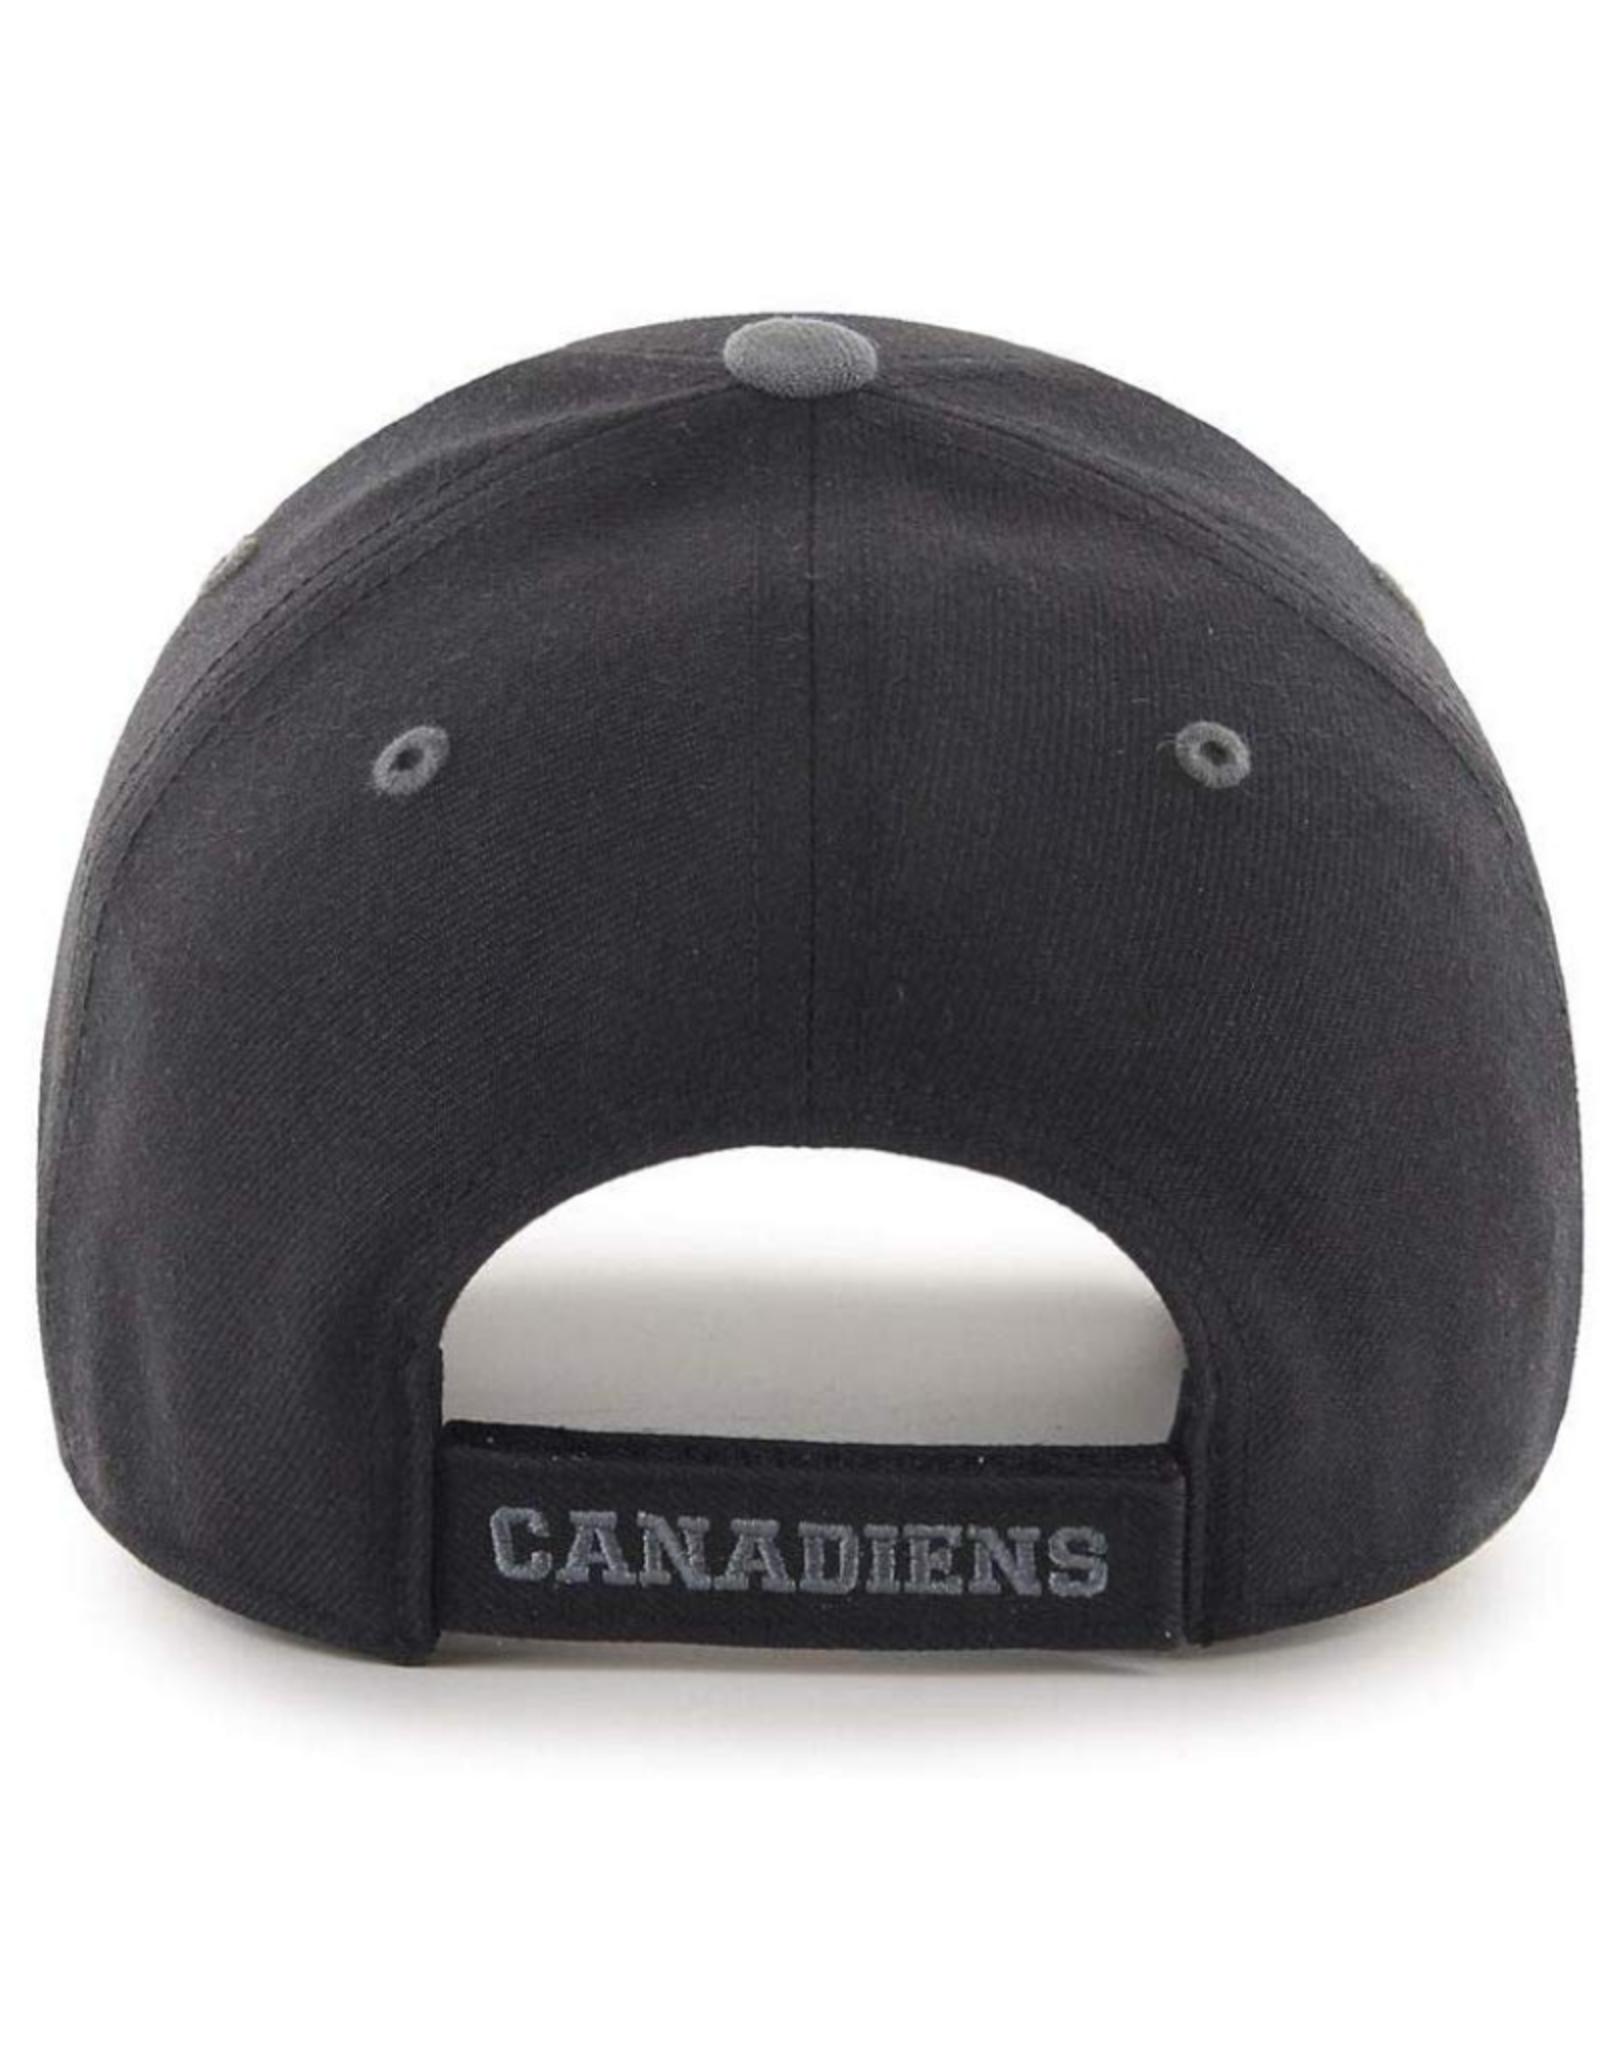 American Needle American Needle Men's Platinum DeBoss Adjustable Hat Montreal Canadiens Black